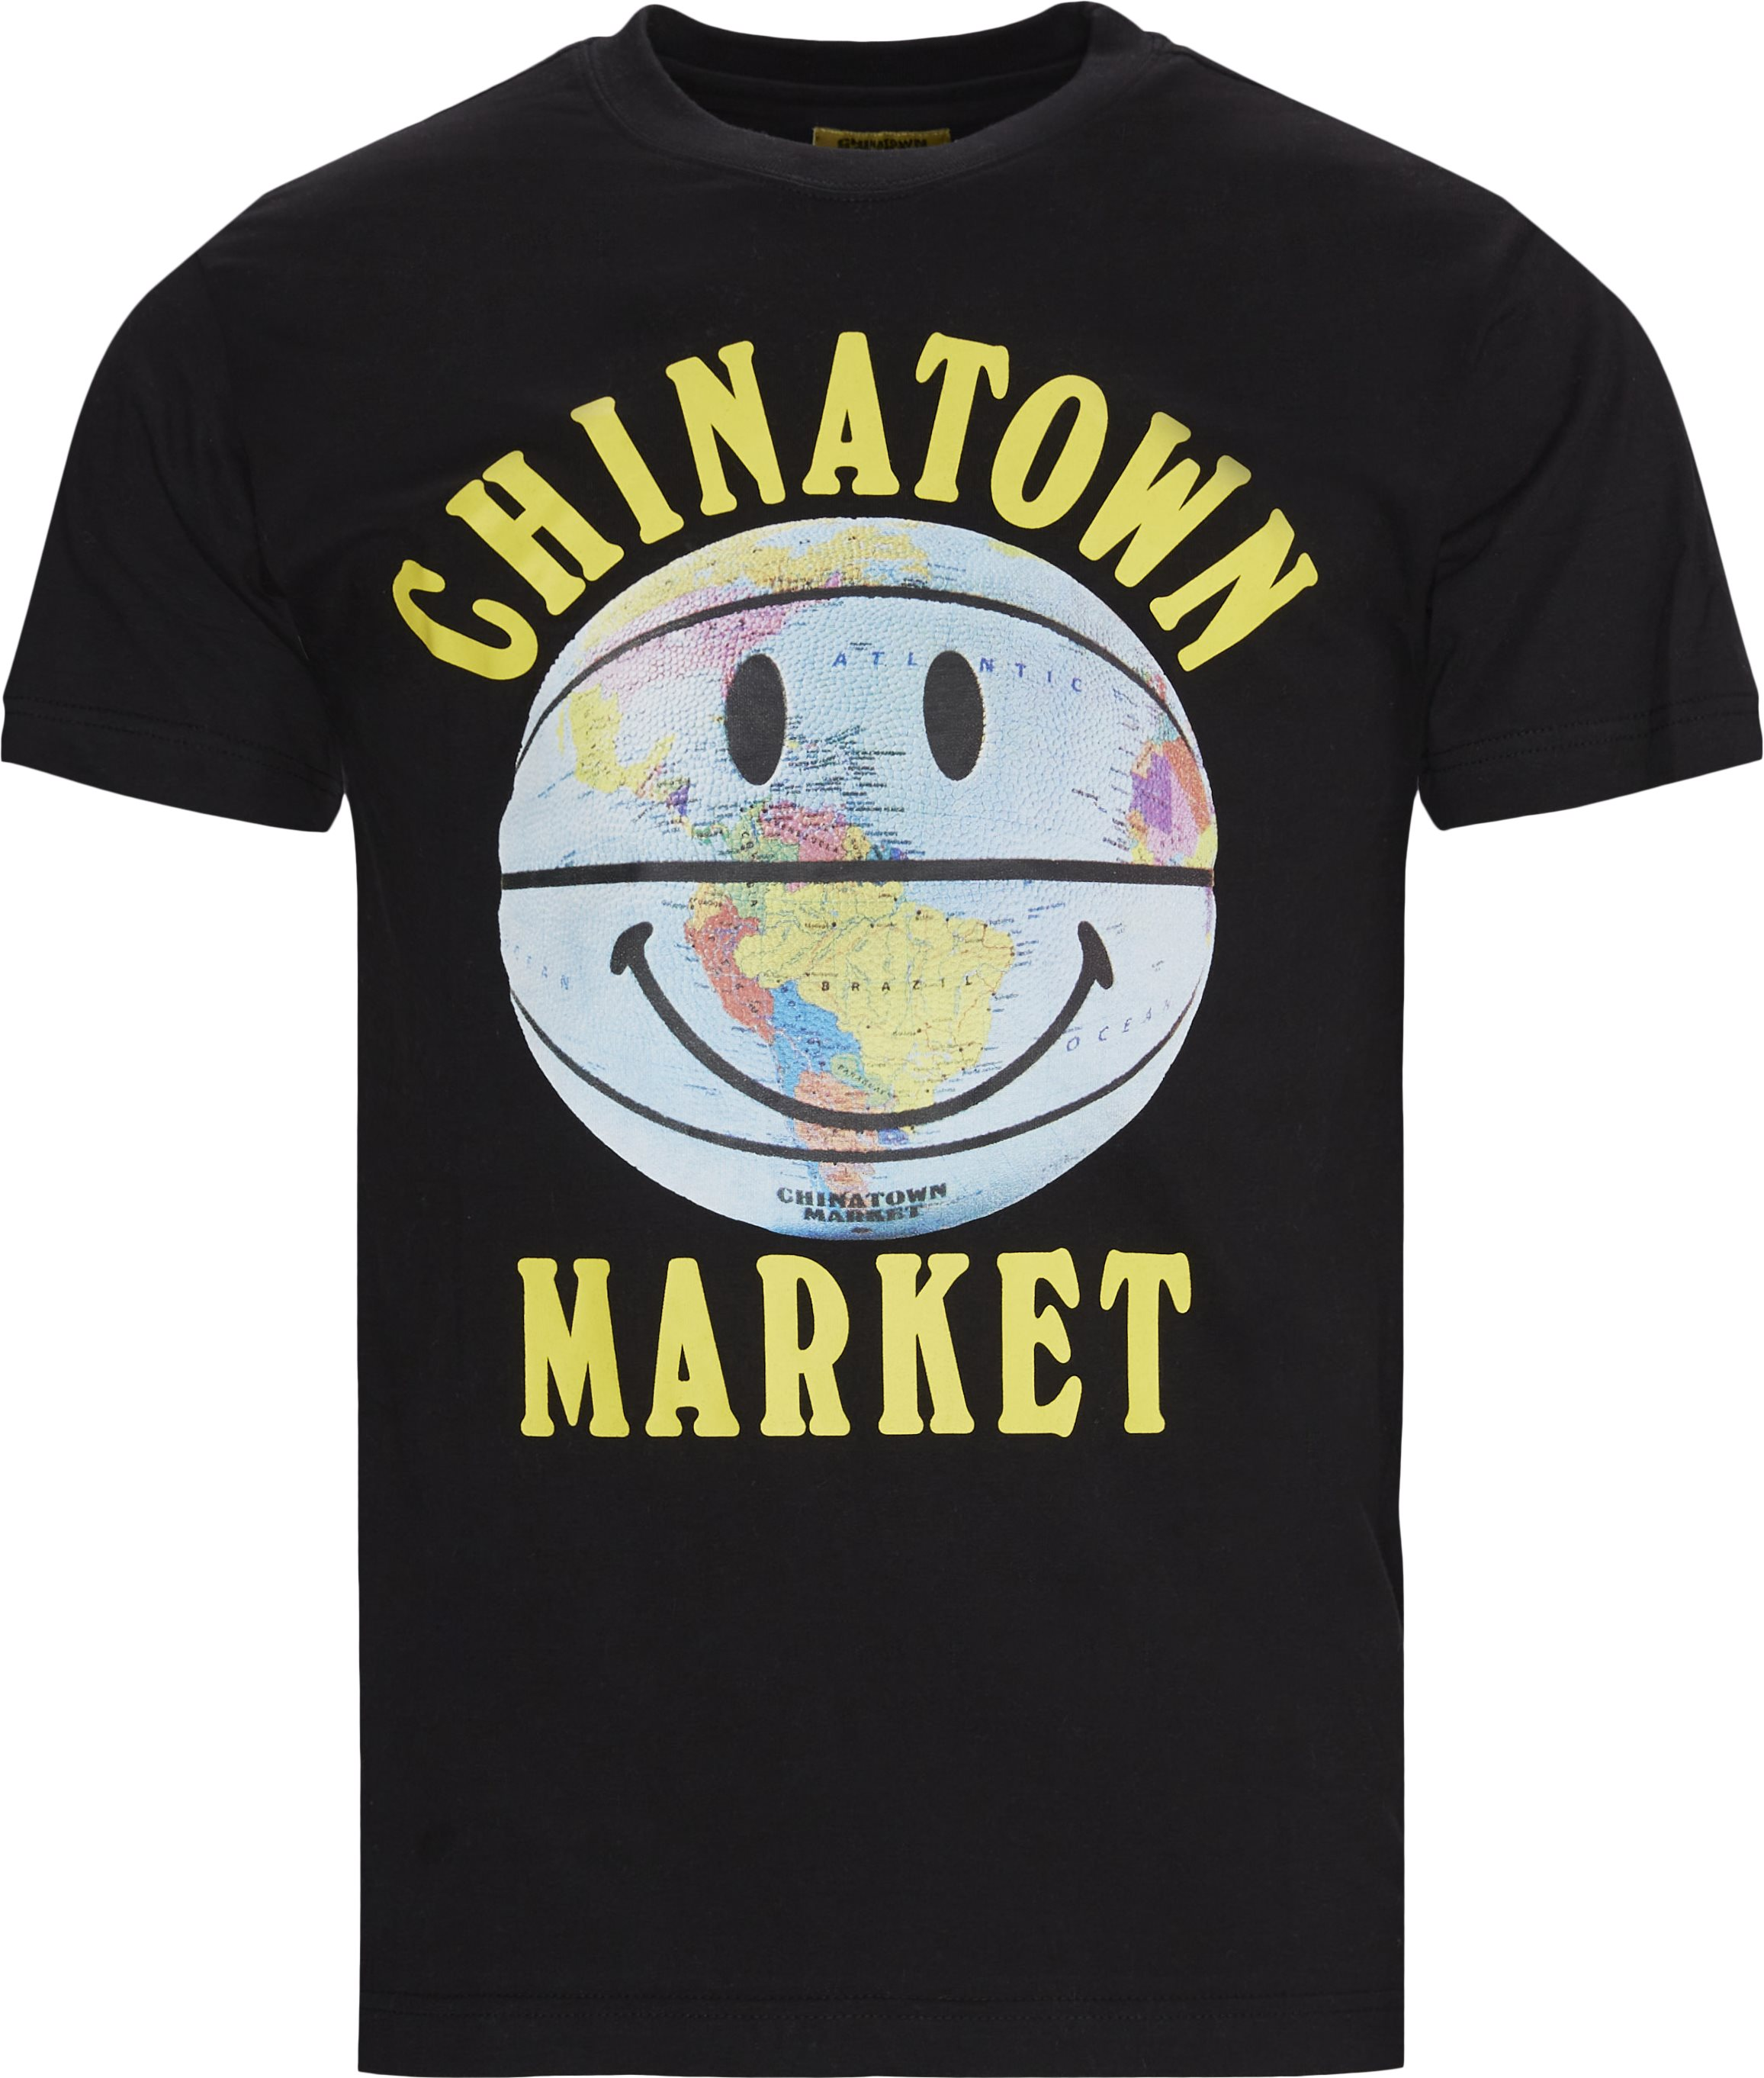 Smiley Globe Ball Tee - T-shirts - Regular fit - Svart